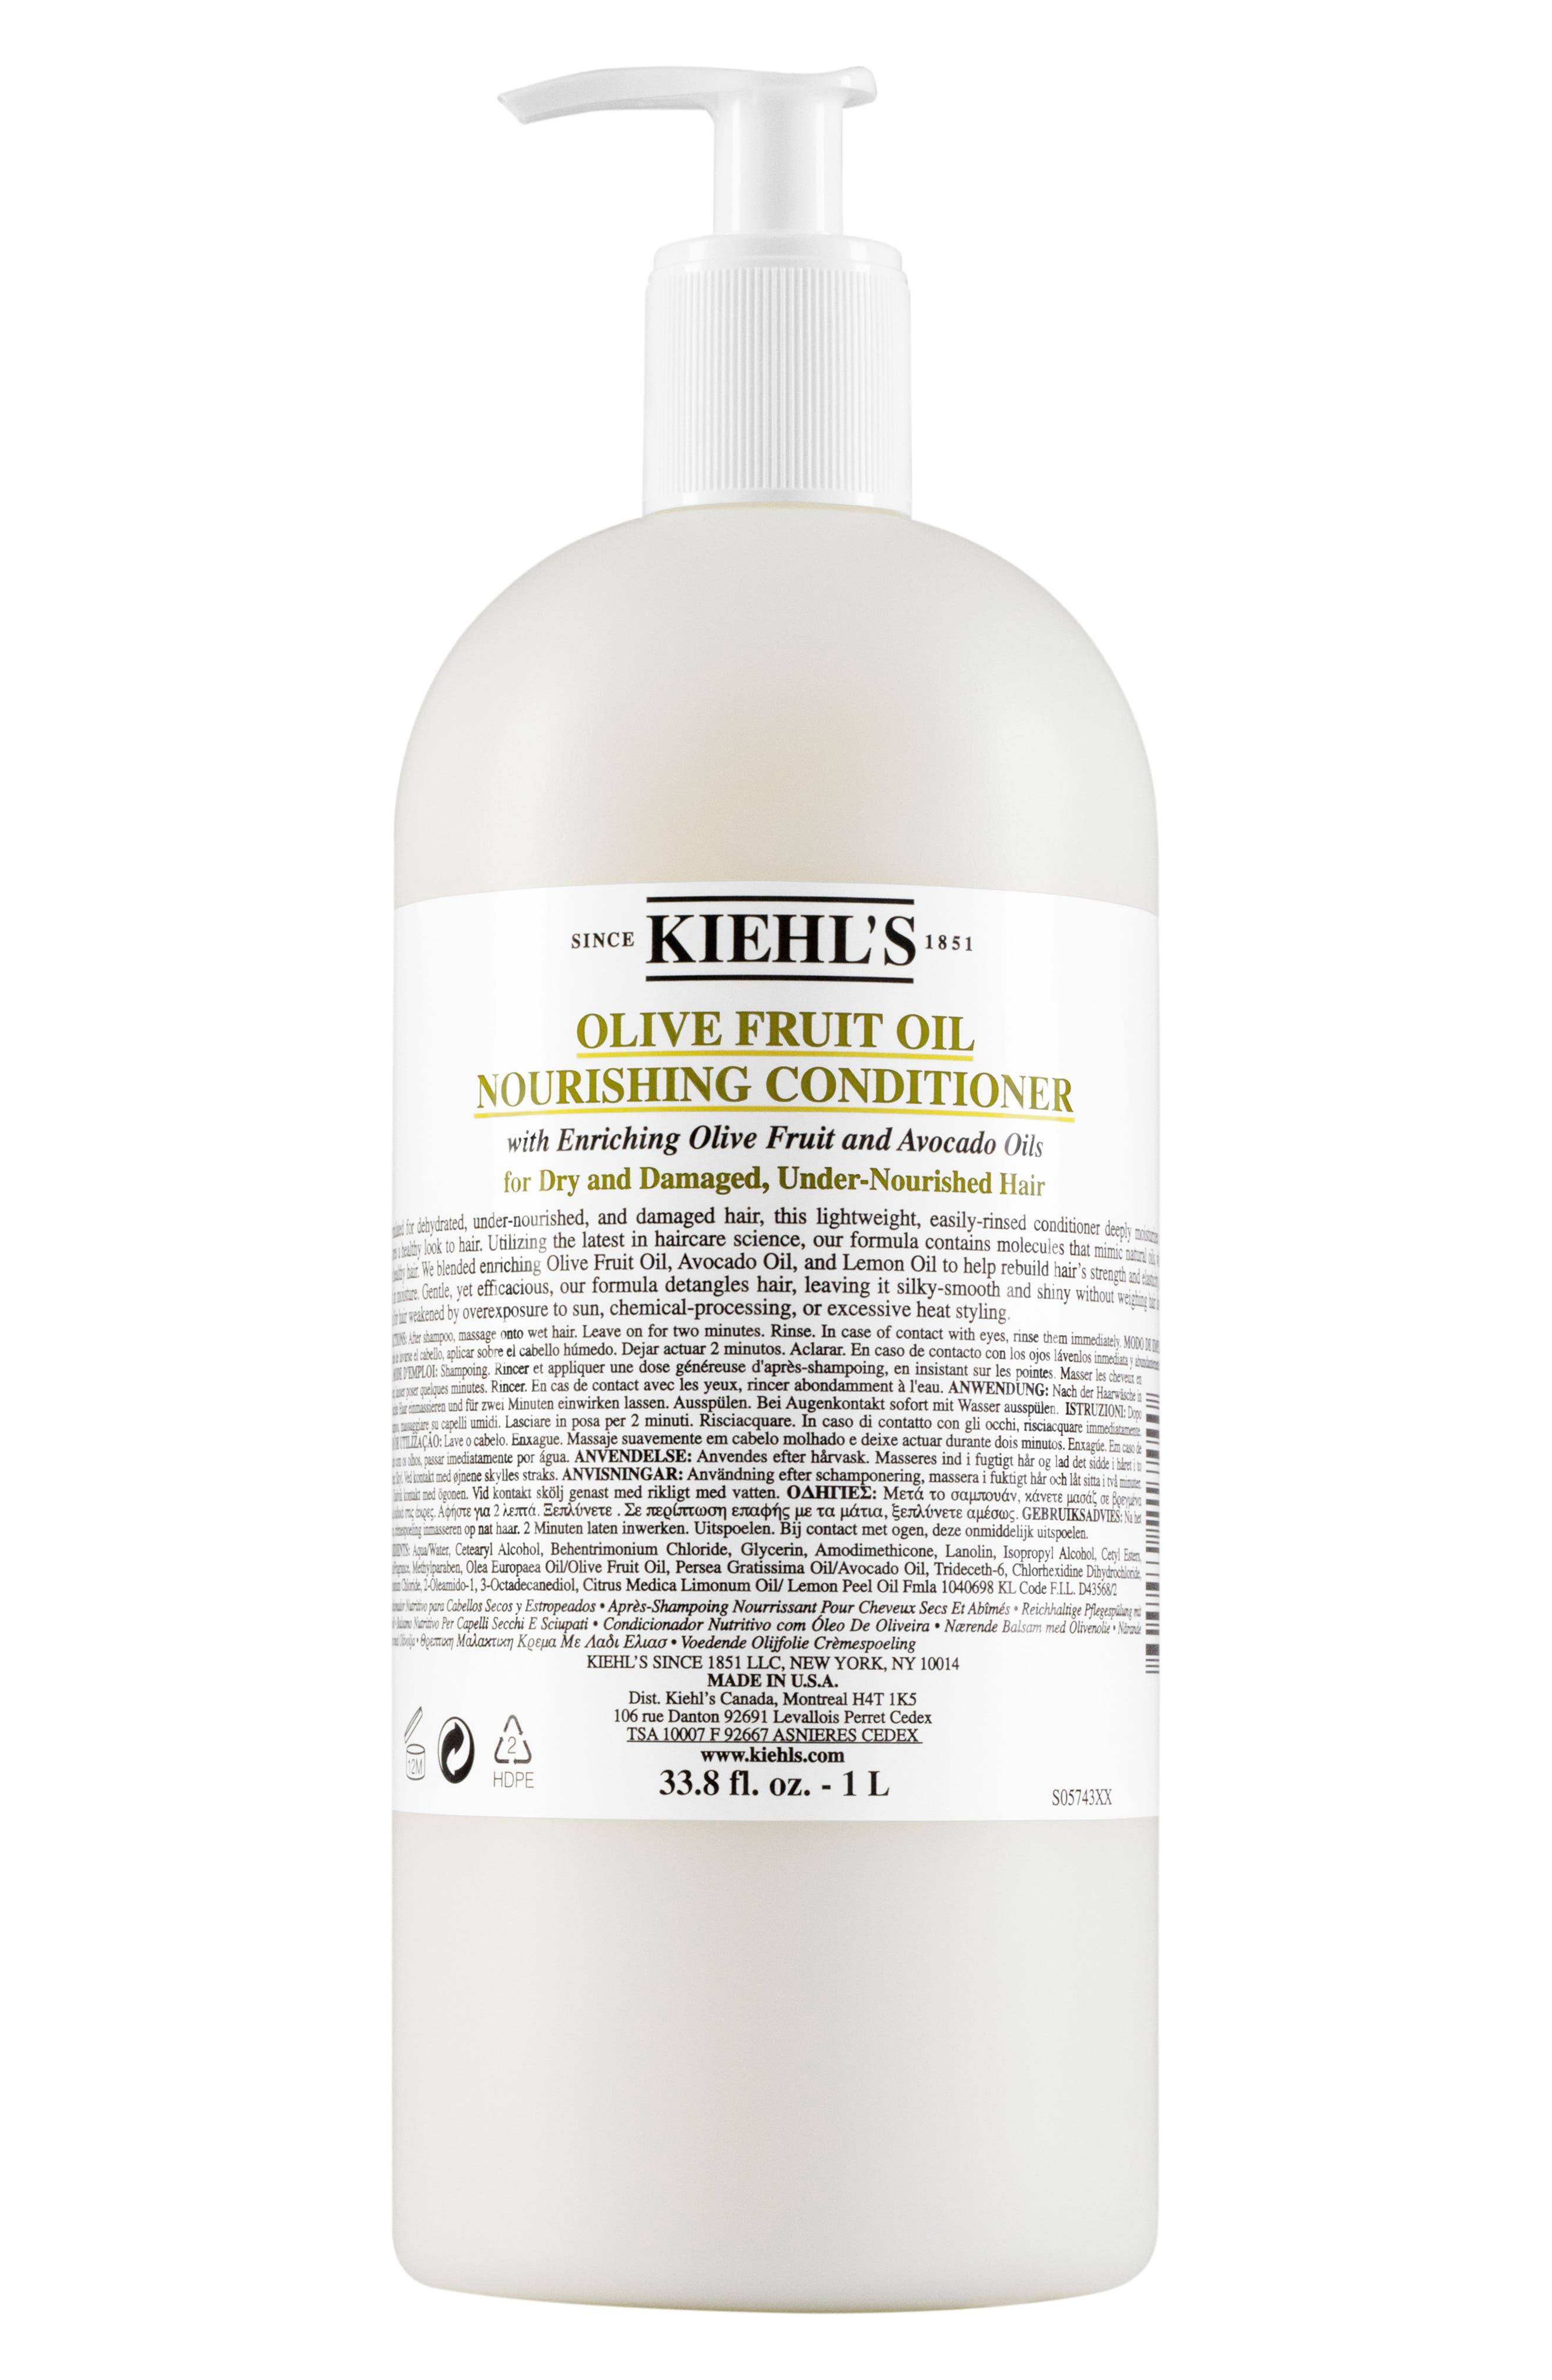 1851 Olive Fruit Oil Nourishing Conditioner